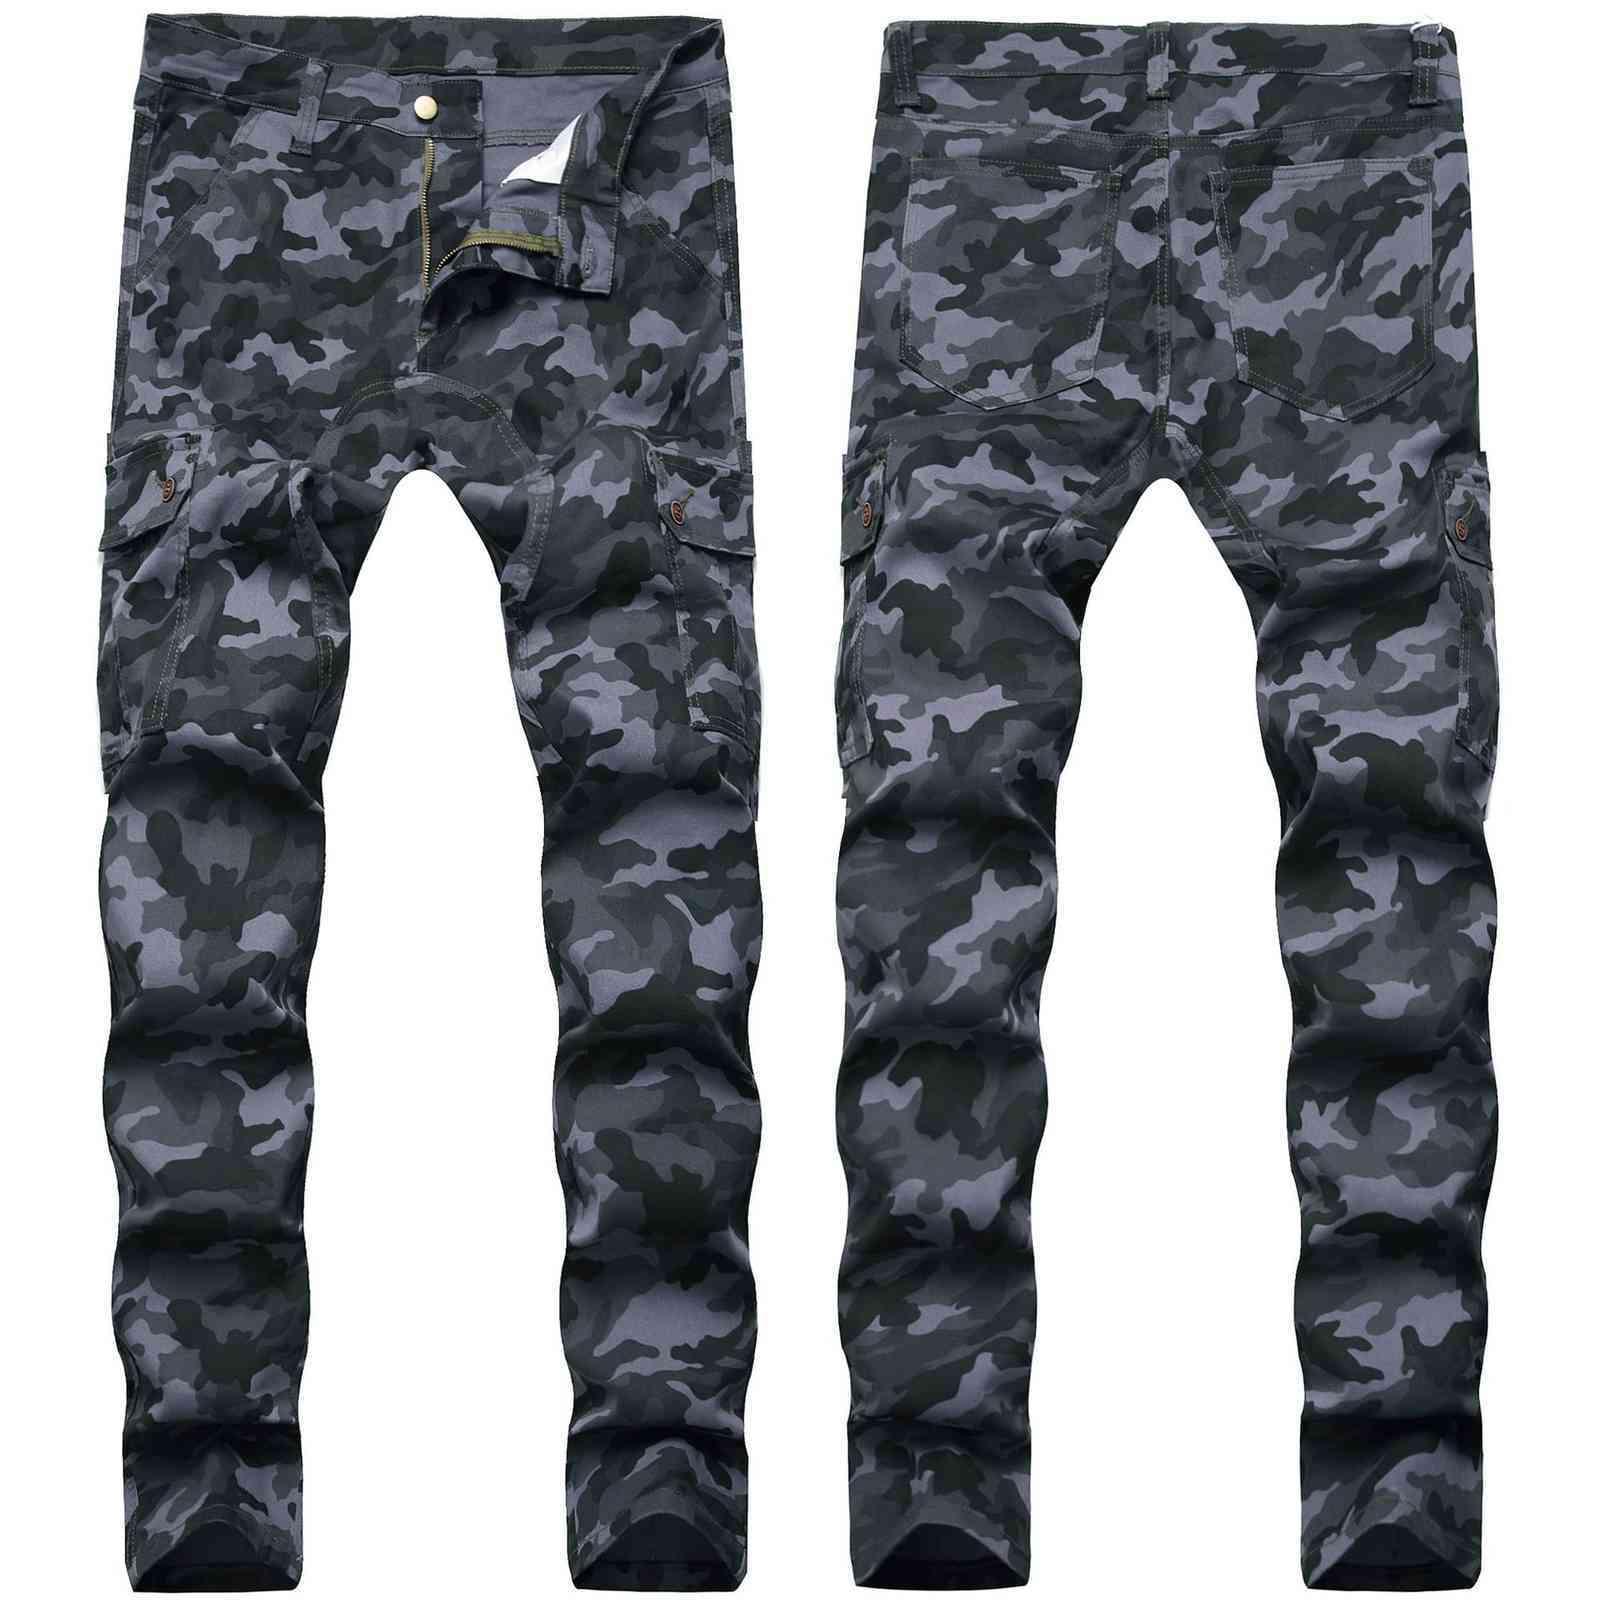 Skinny Mens Camo Jeans Cool Men Jeans Stretch Slim Fit Denim Biker Jeans Hip Hop Men Streetwear 733#